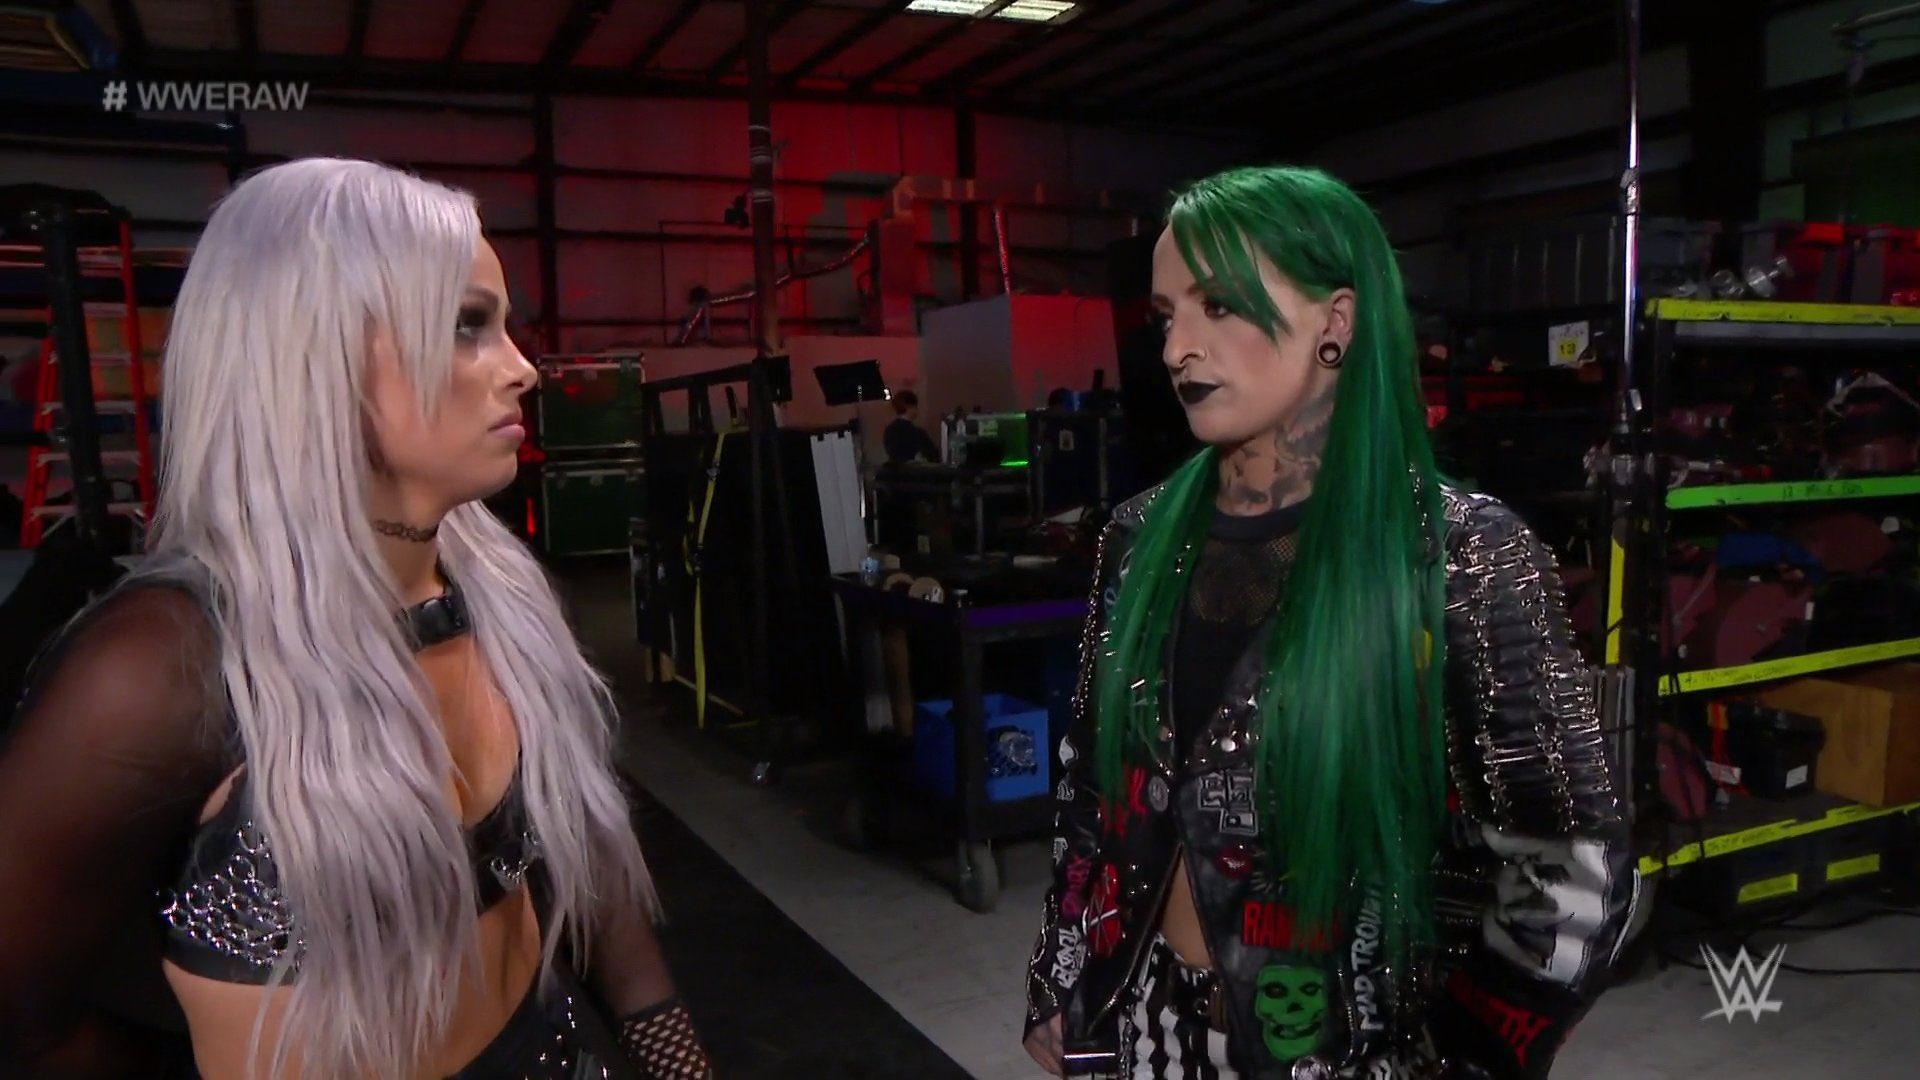 Liv Morgan y Ruby Riott se reúnen en WWE Raw (22/06/2020) / WWE Liv Morgan ya no será estrella en WWE